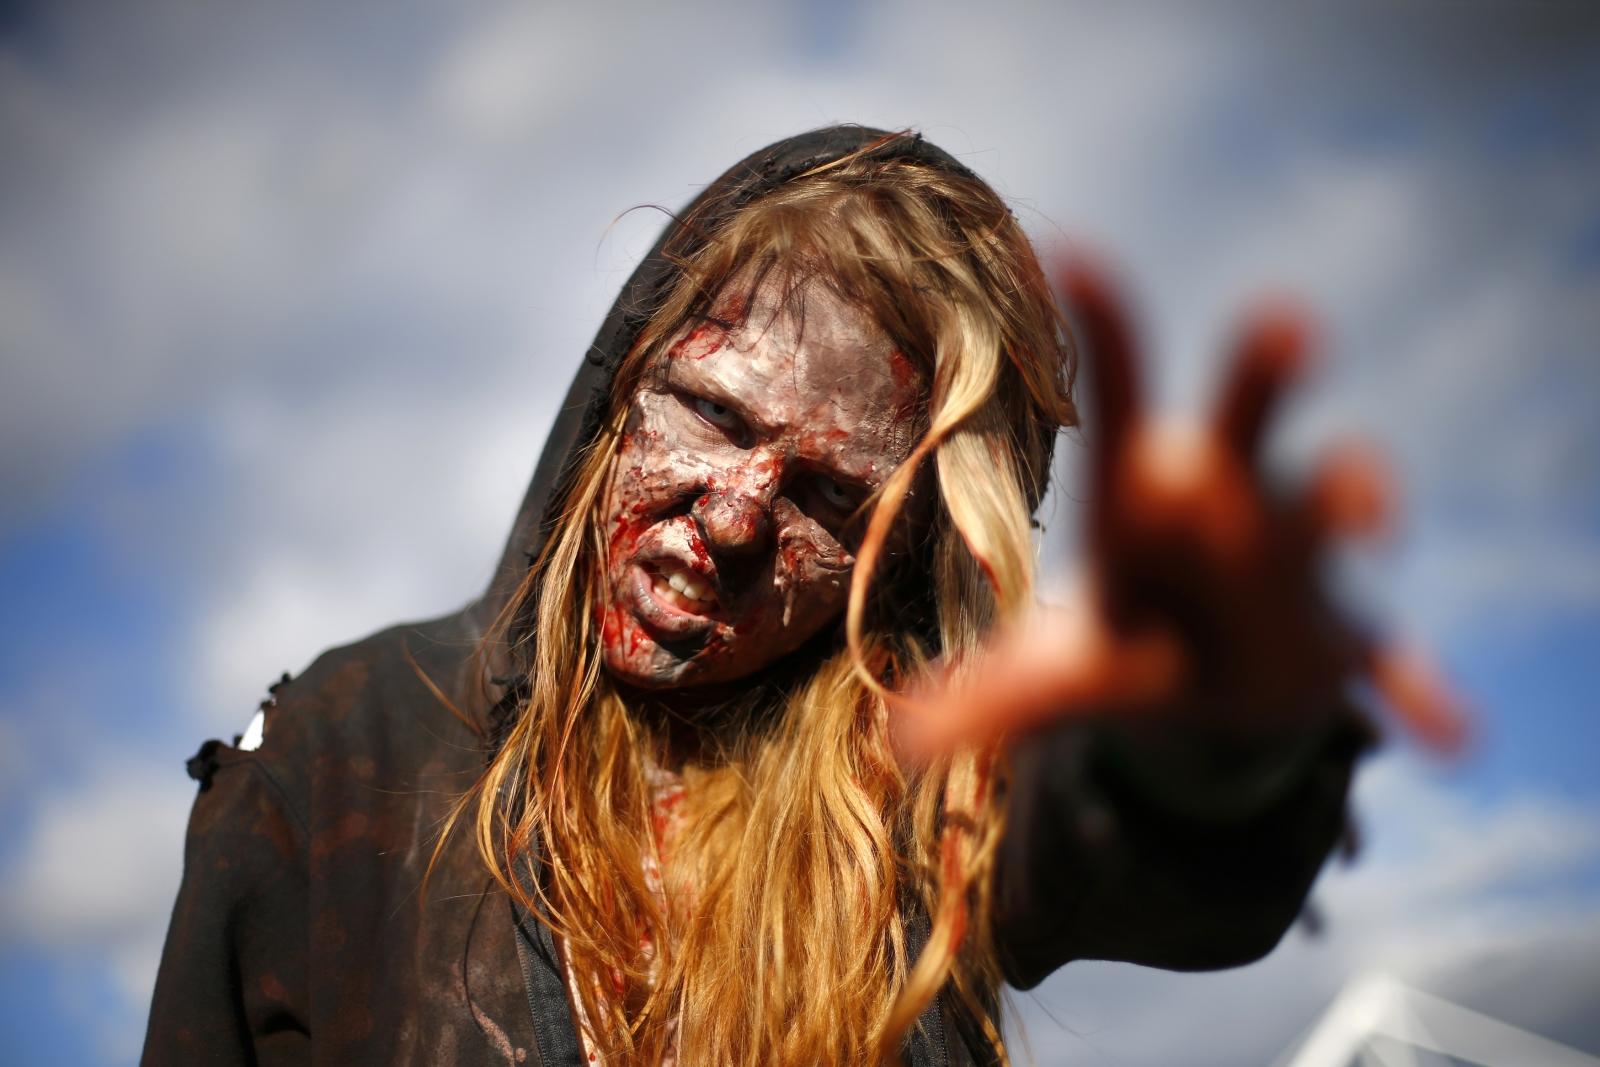 Walking Dead-esque 'zombie' protestors demand an end to Russian propaganda on Ukraine TV